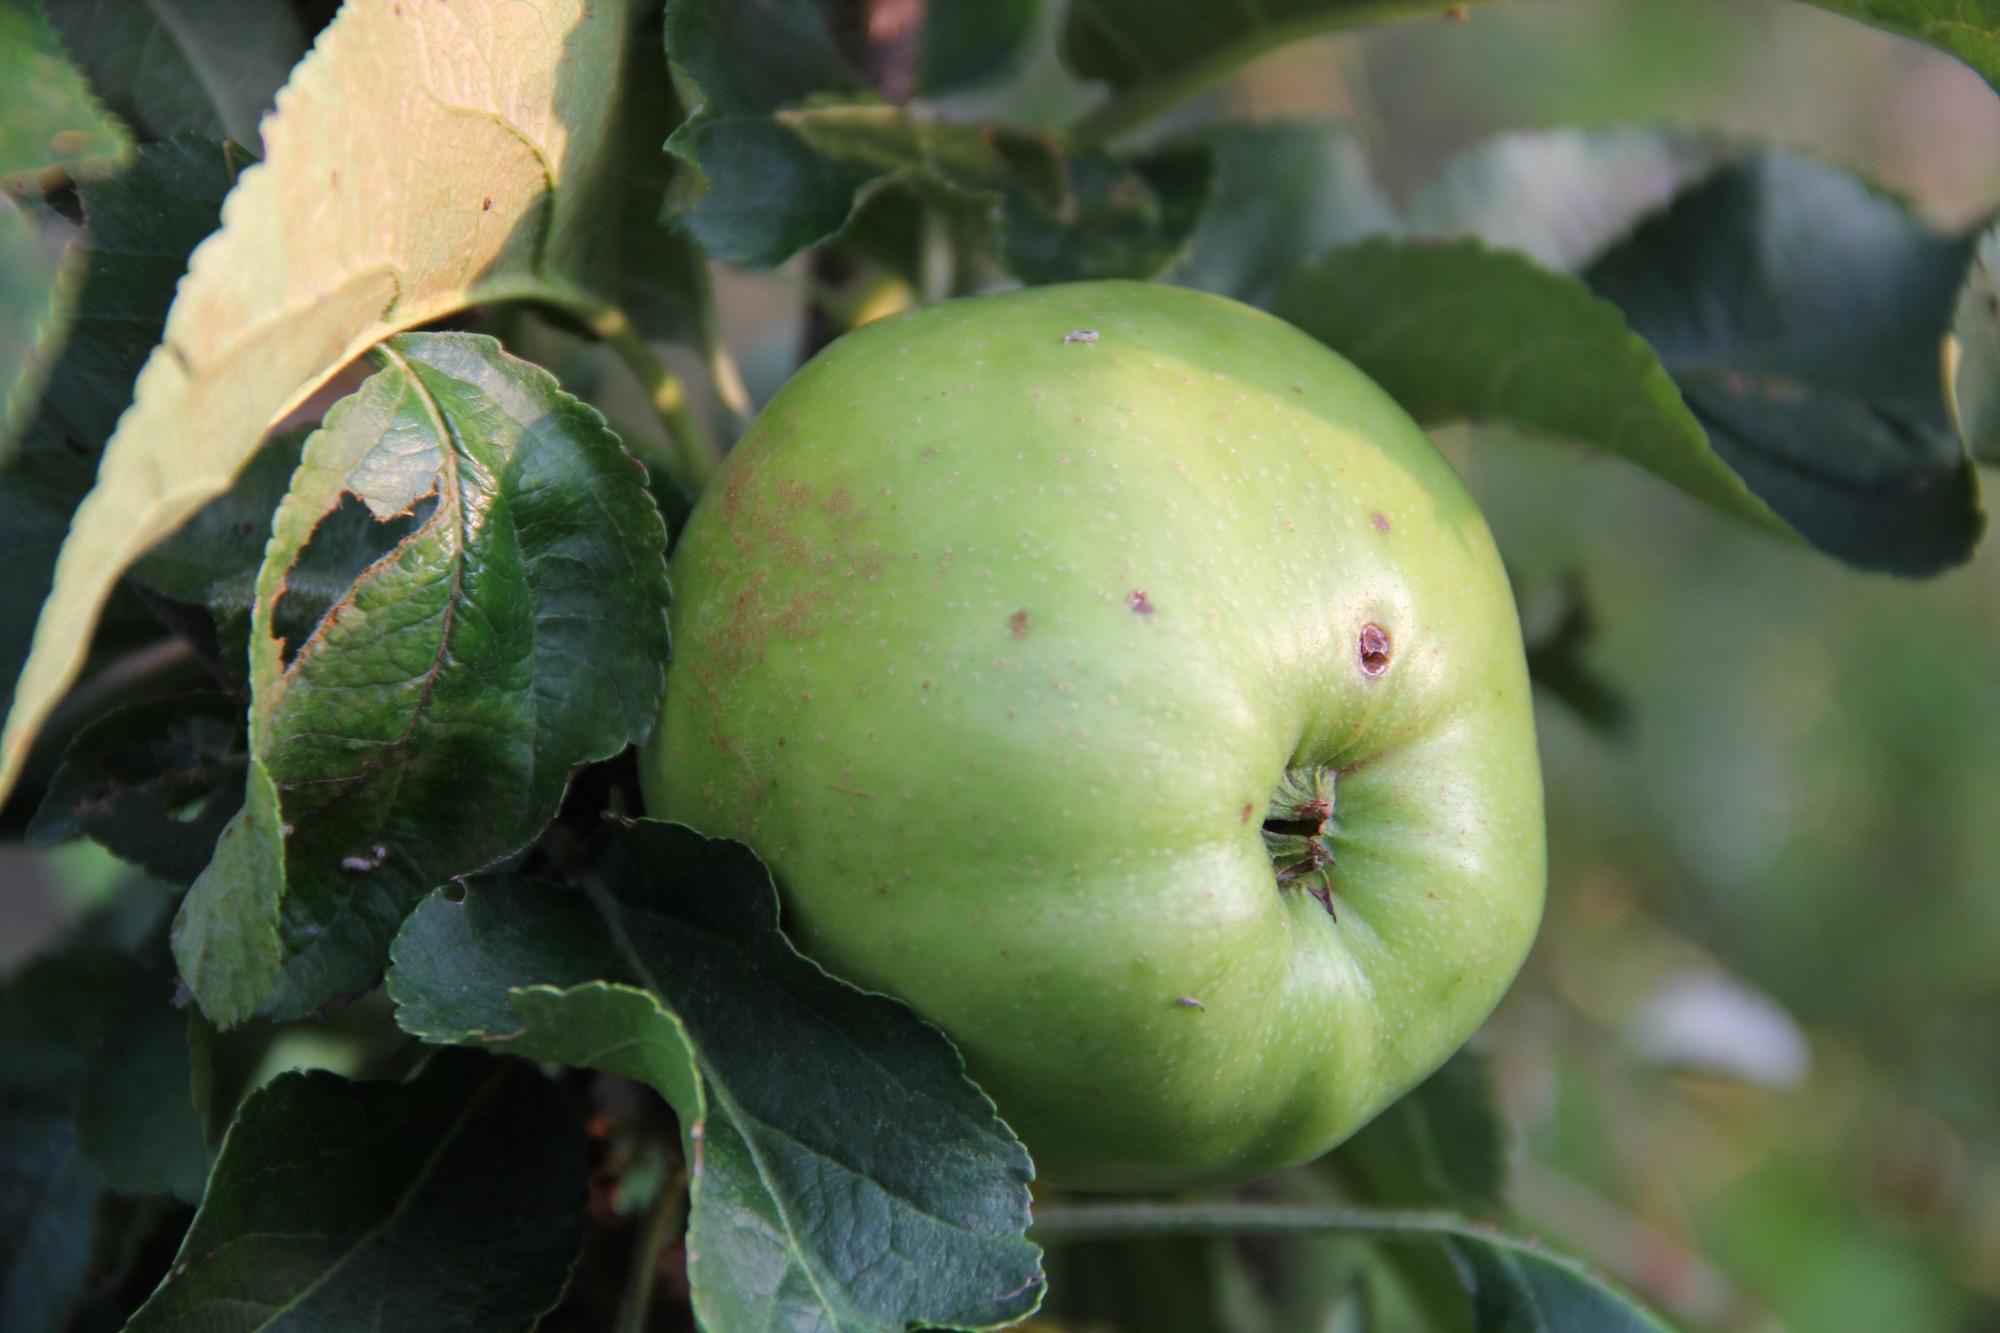 Grüner Apfel am Baum